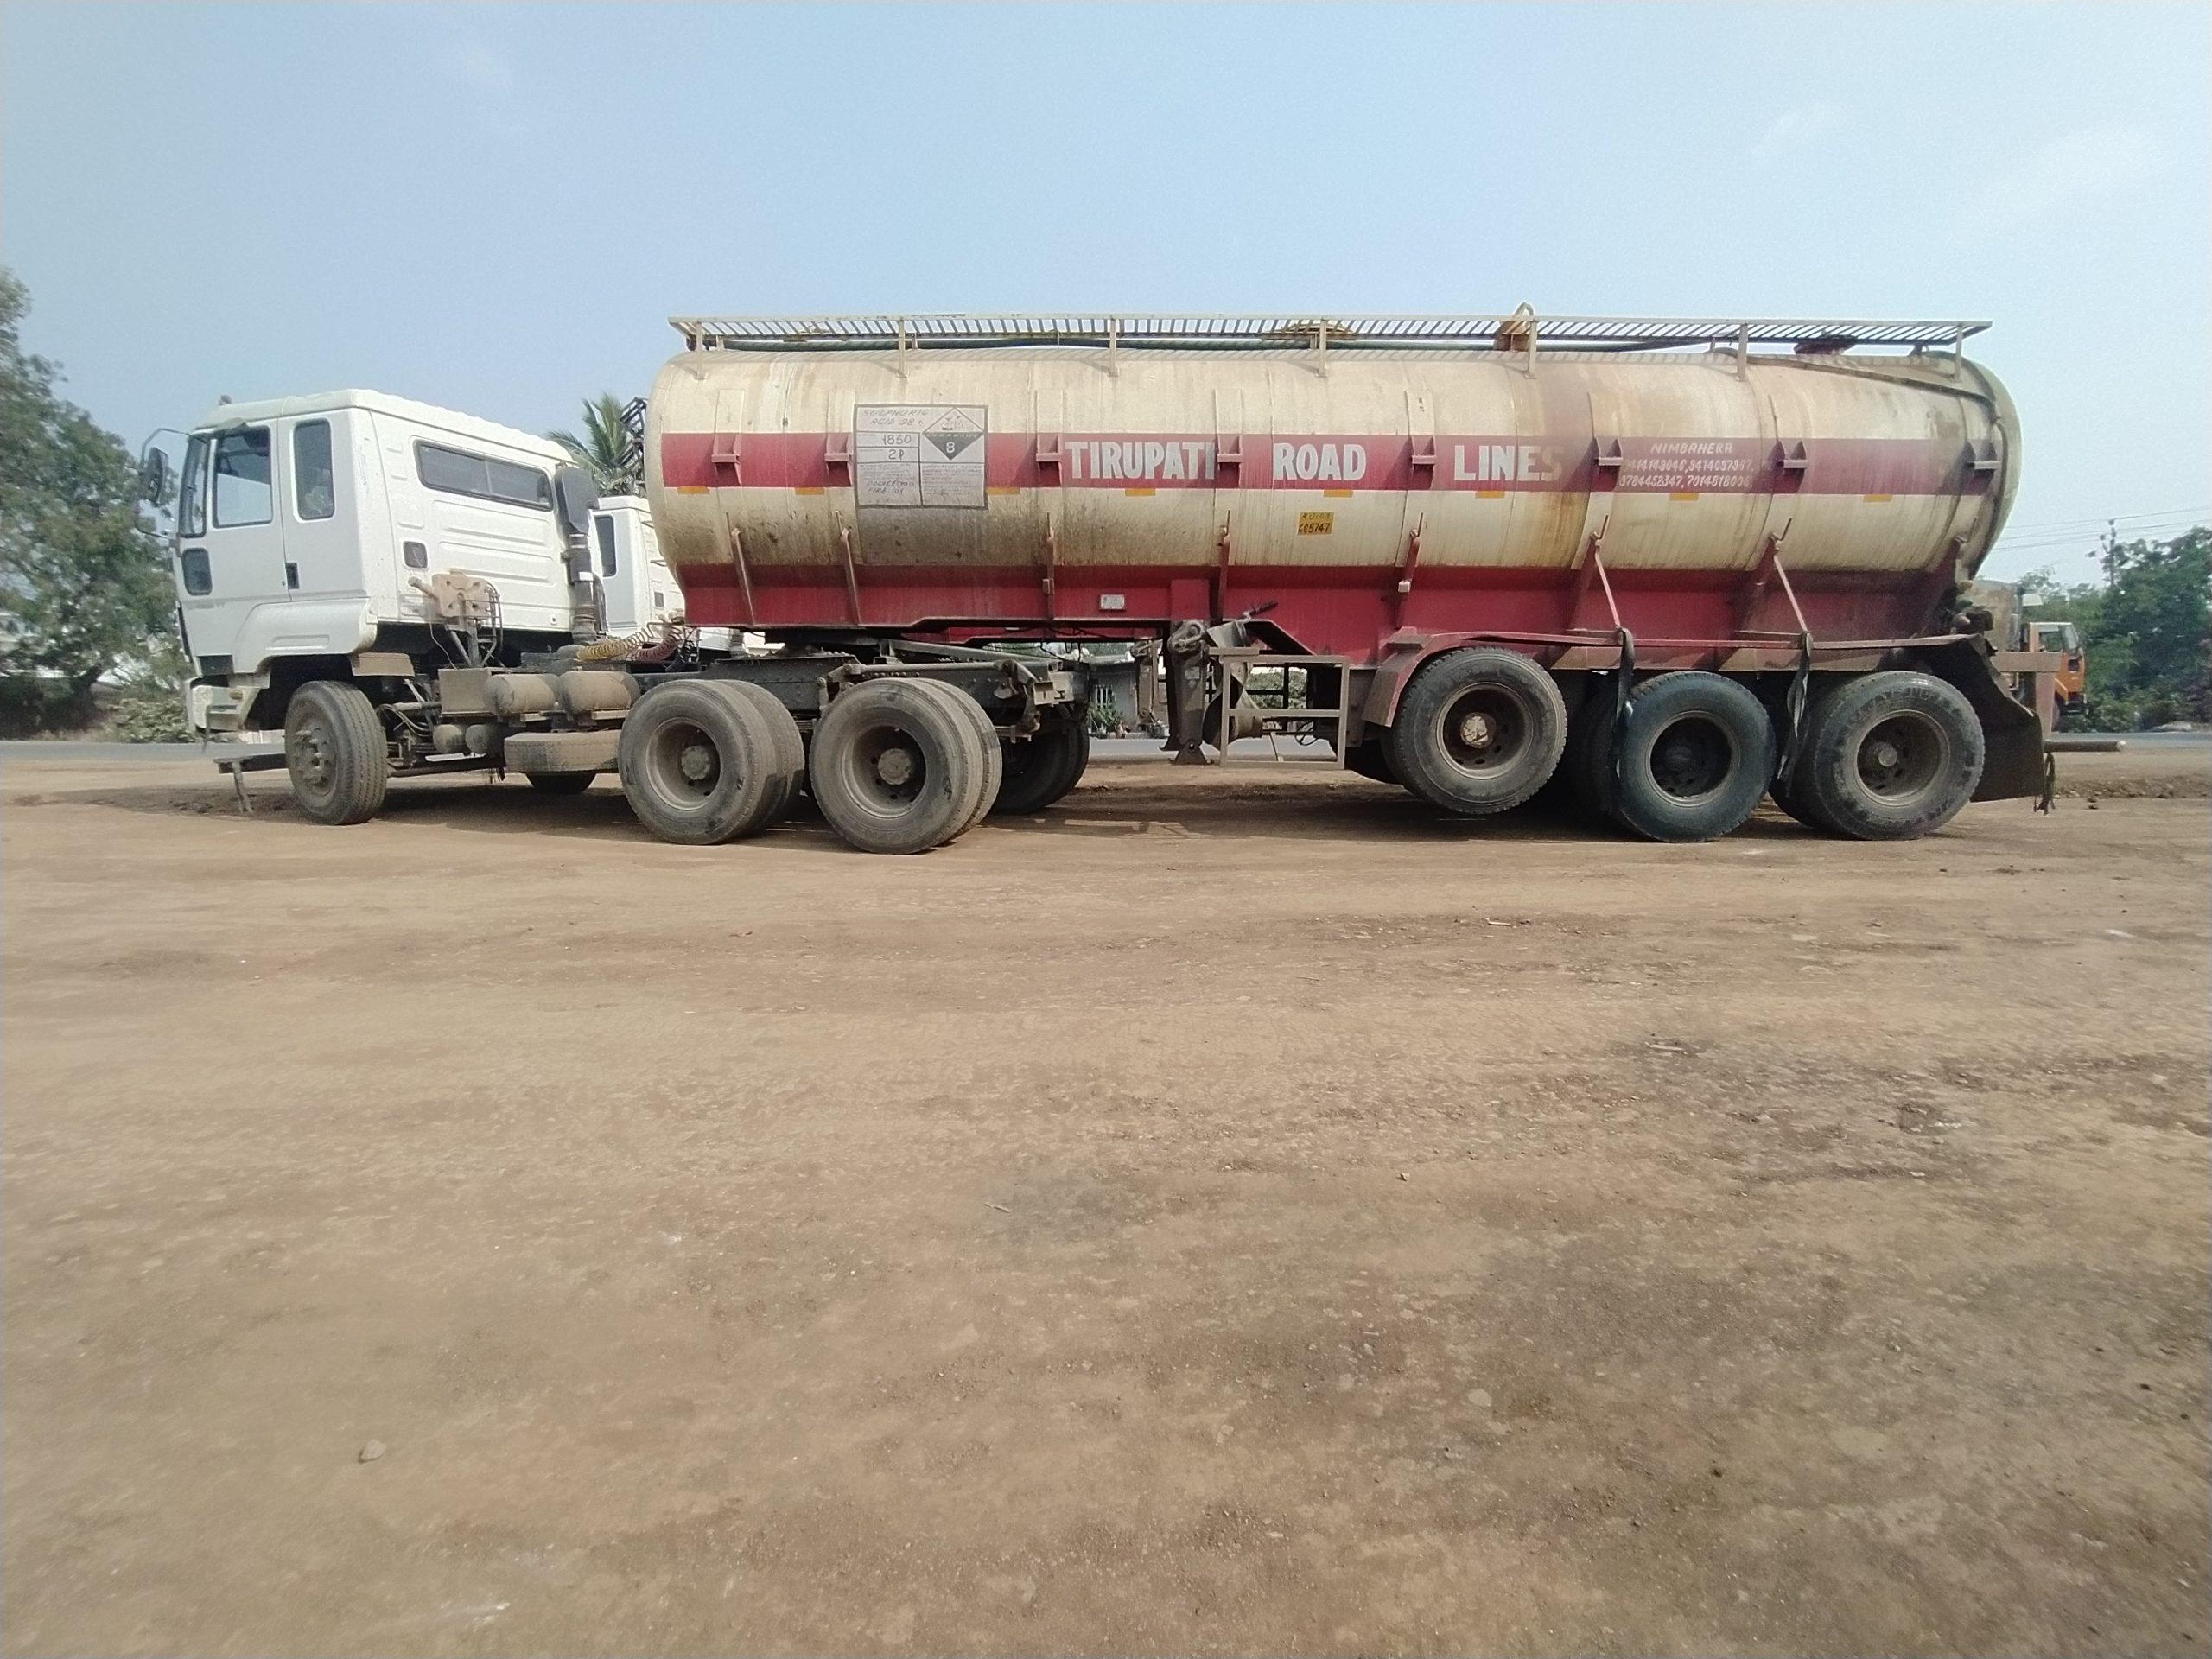 truck on the raod